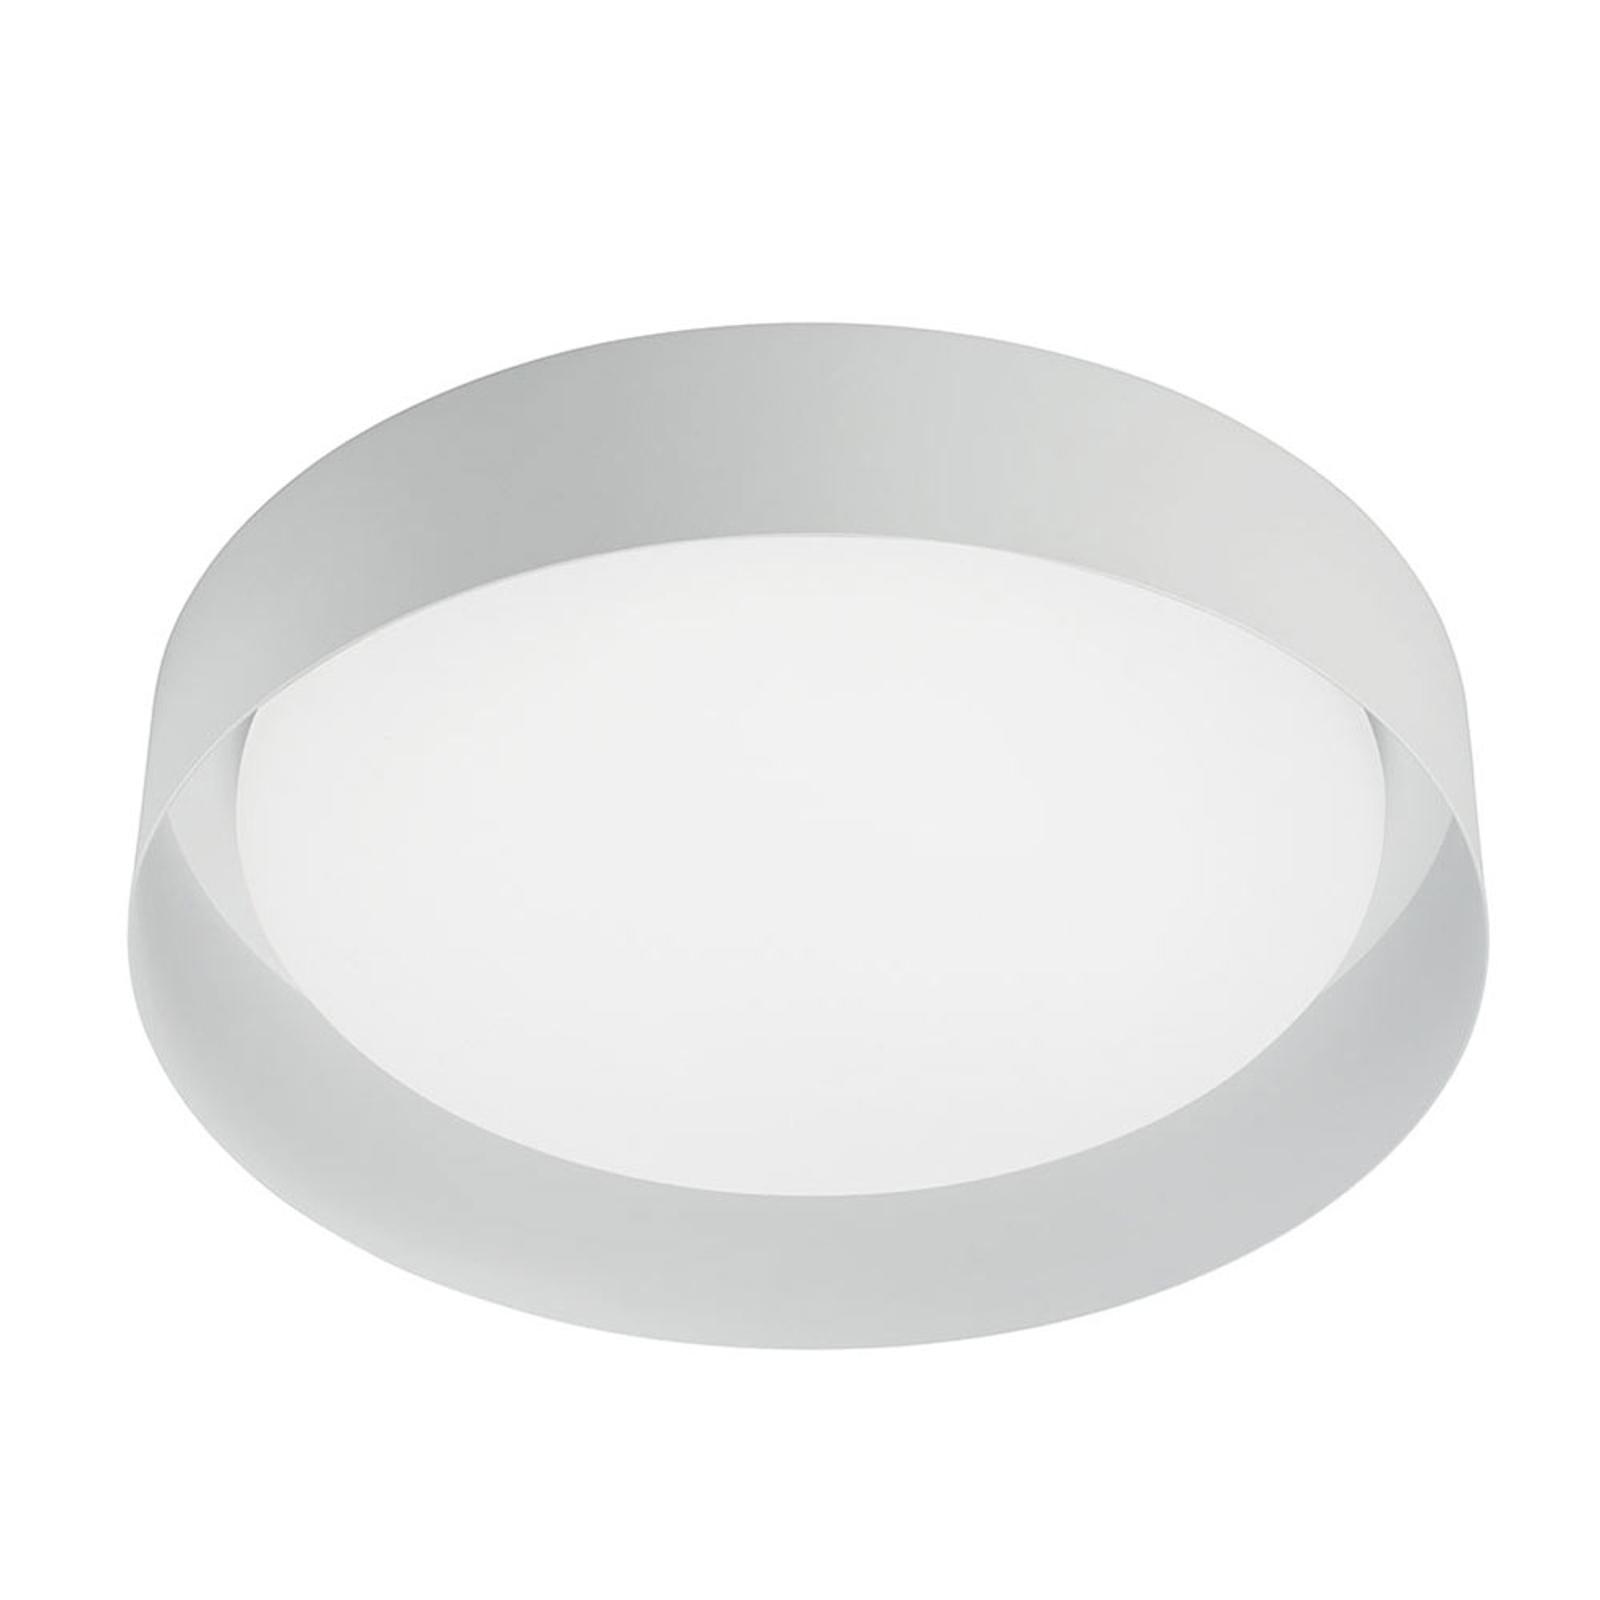 Lampa sufitowa LED Crew 2, Ø 26 cm, biała